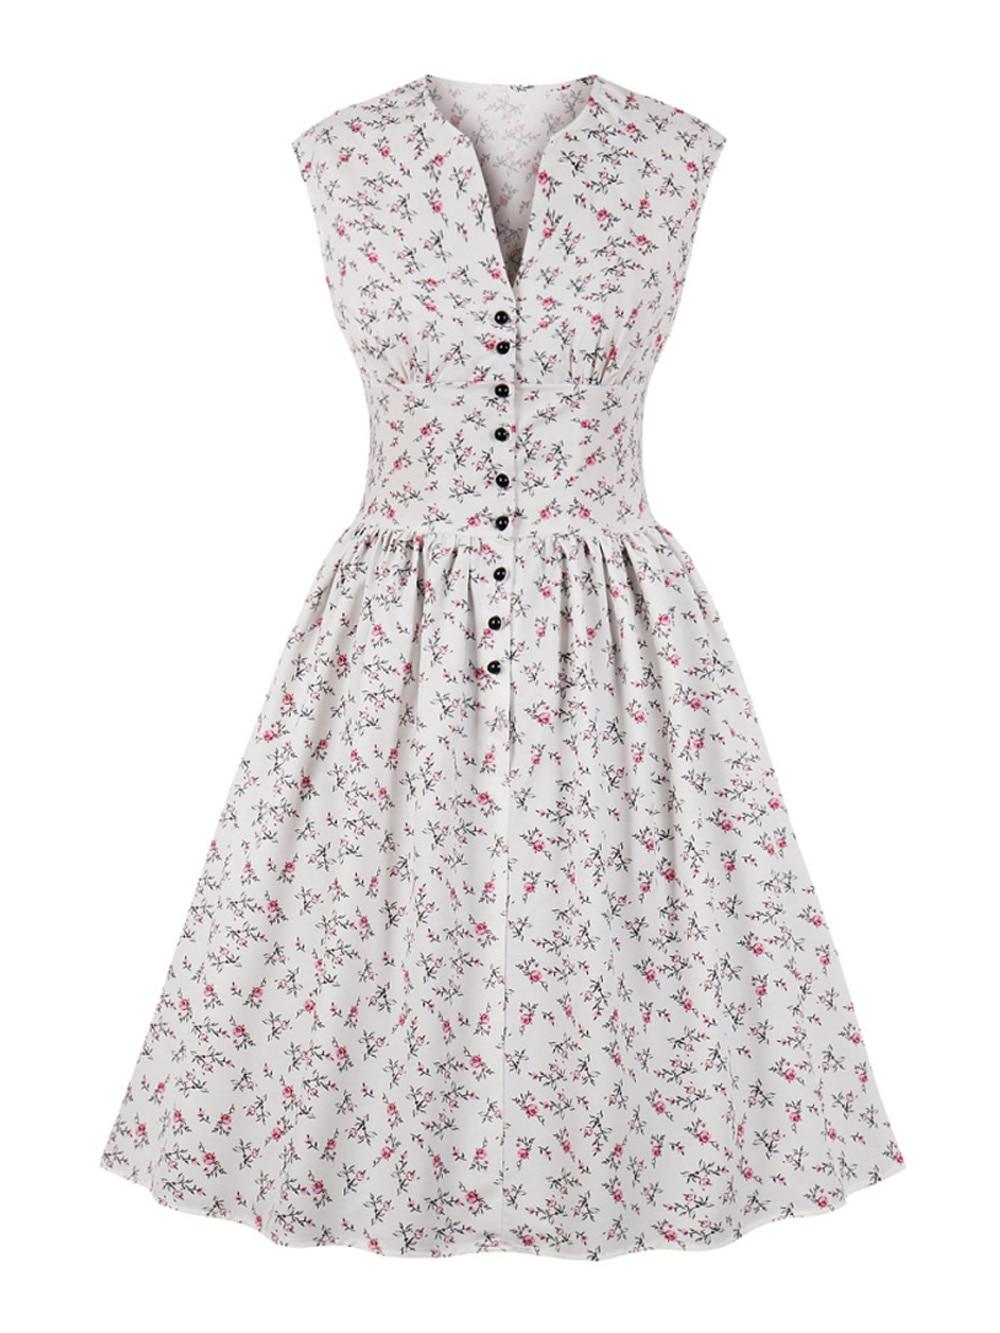 52dfab1665 ZAN.STYLE 2019 Women Summer Vintage Dress Floral Print V-Neck Sleeveless  Pin Up Vestidos Button Fly Party Rockabilly Retro Dress